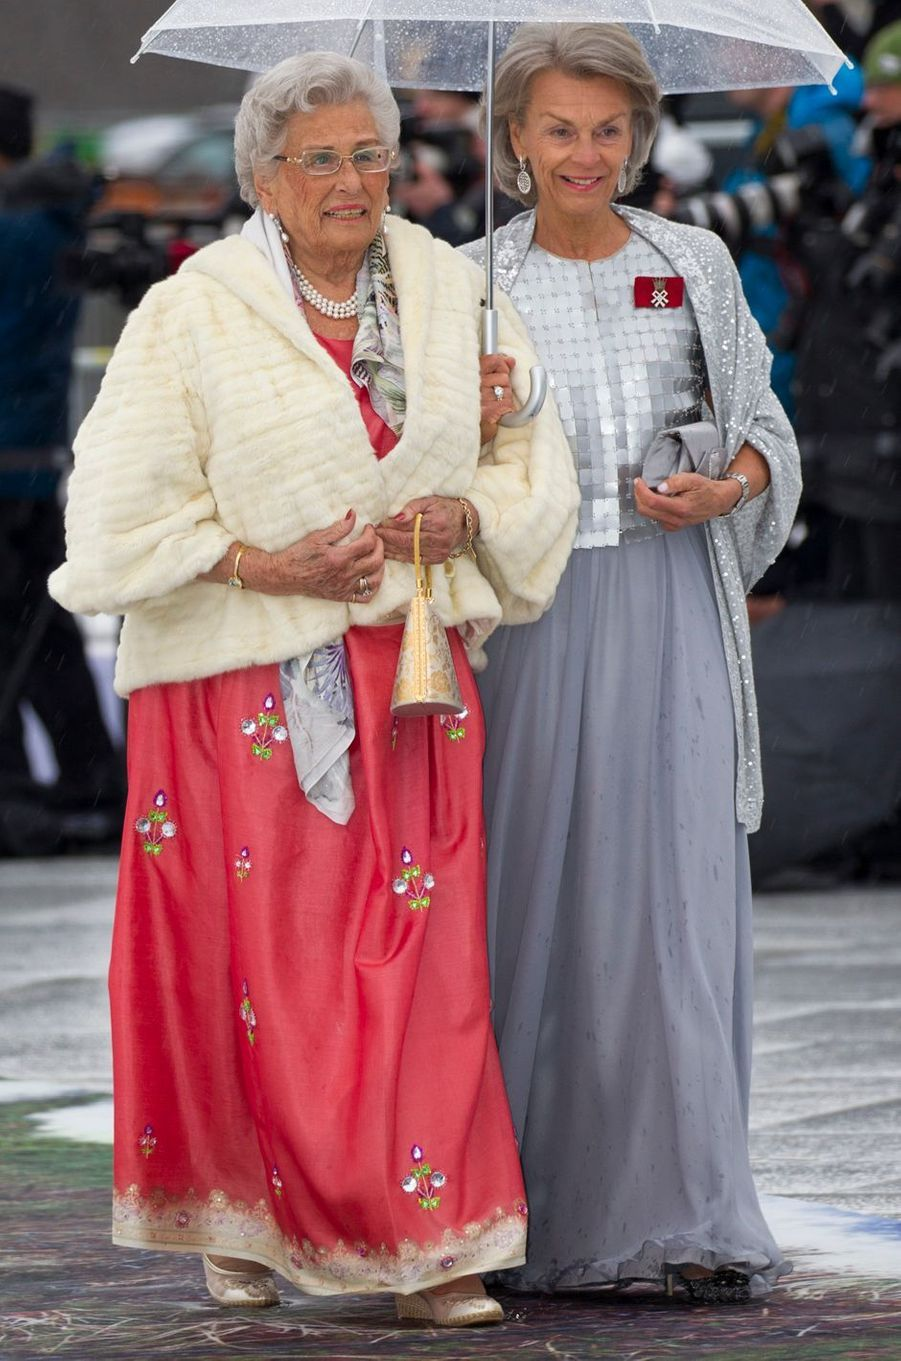 La princesse Astrid de Norvège à Oslo le 10 mai 2017